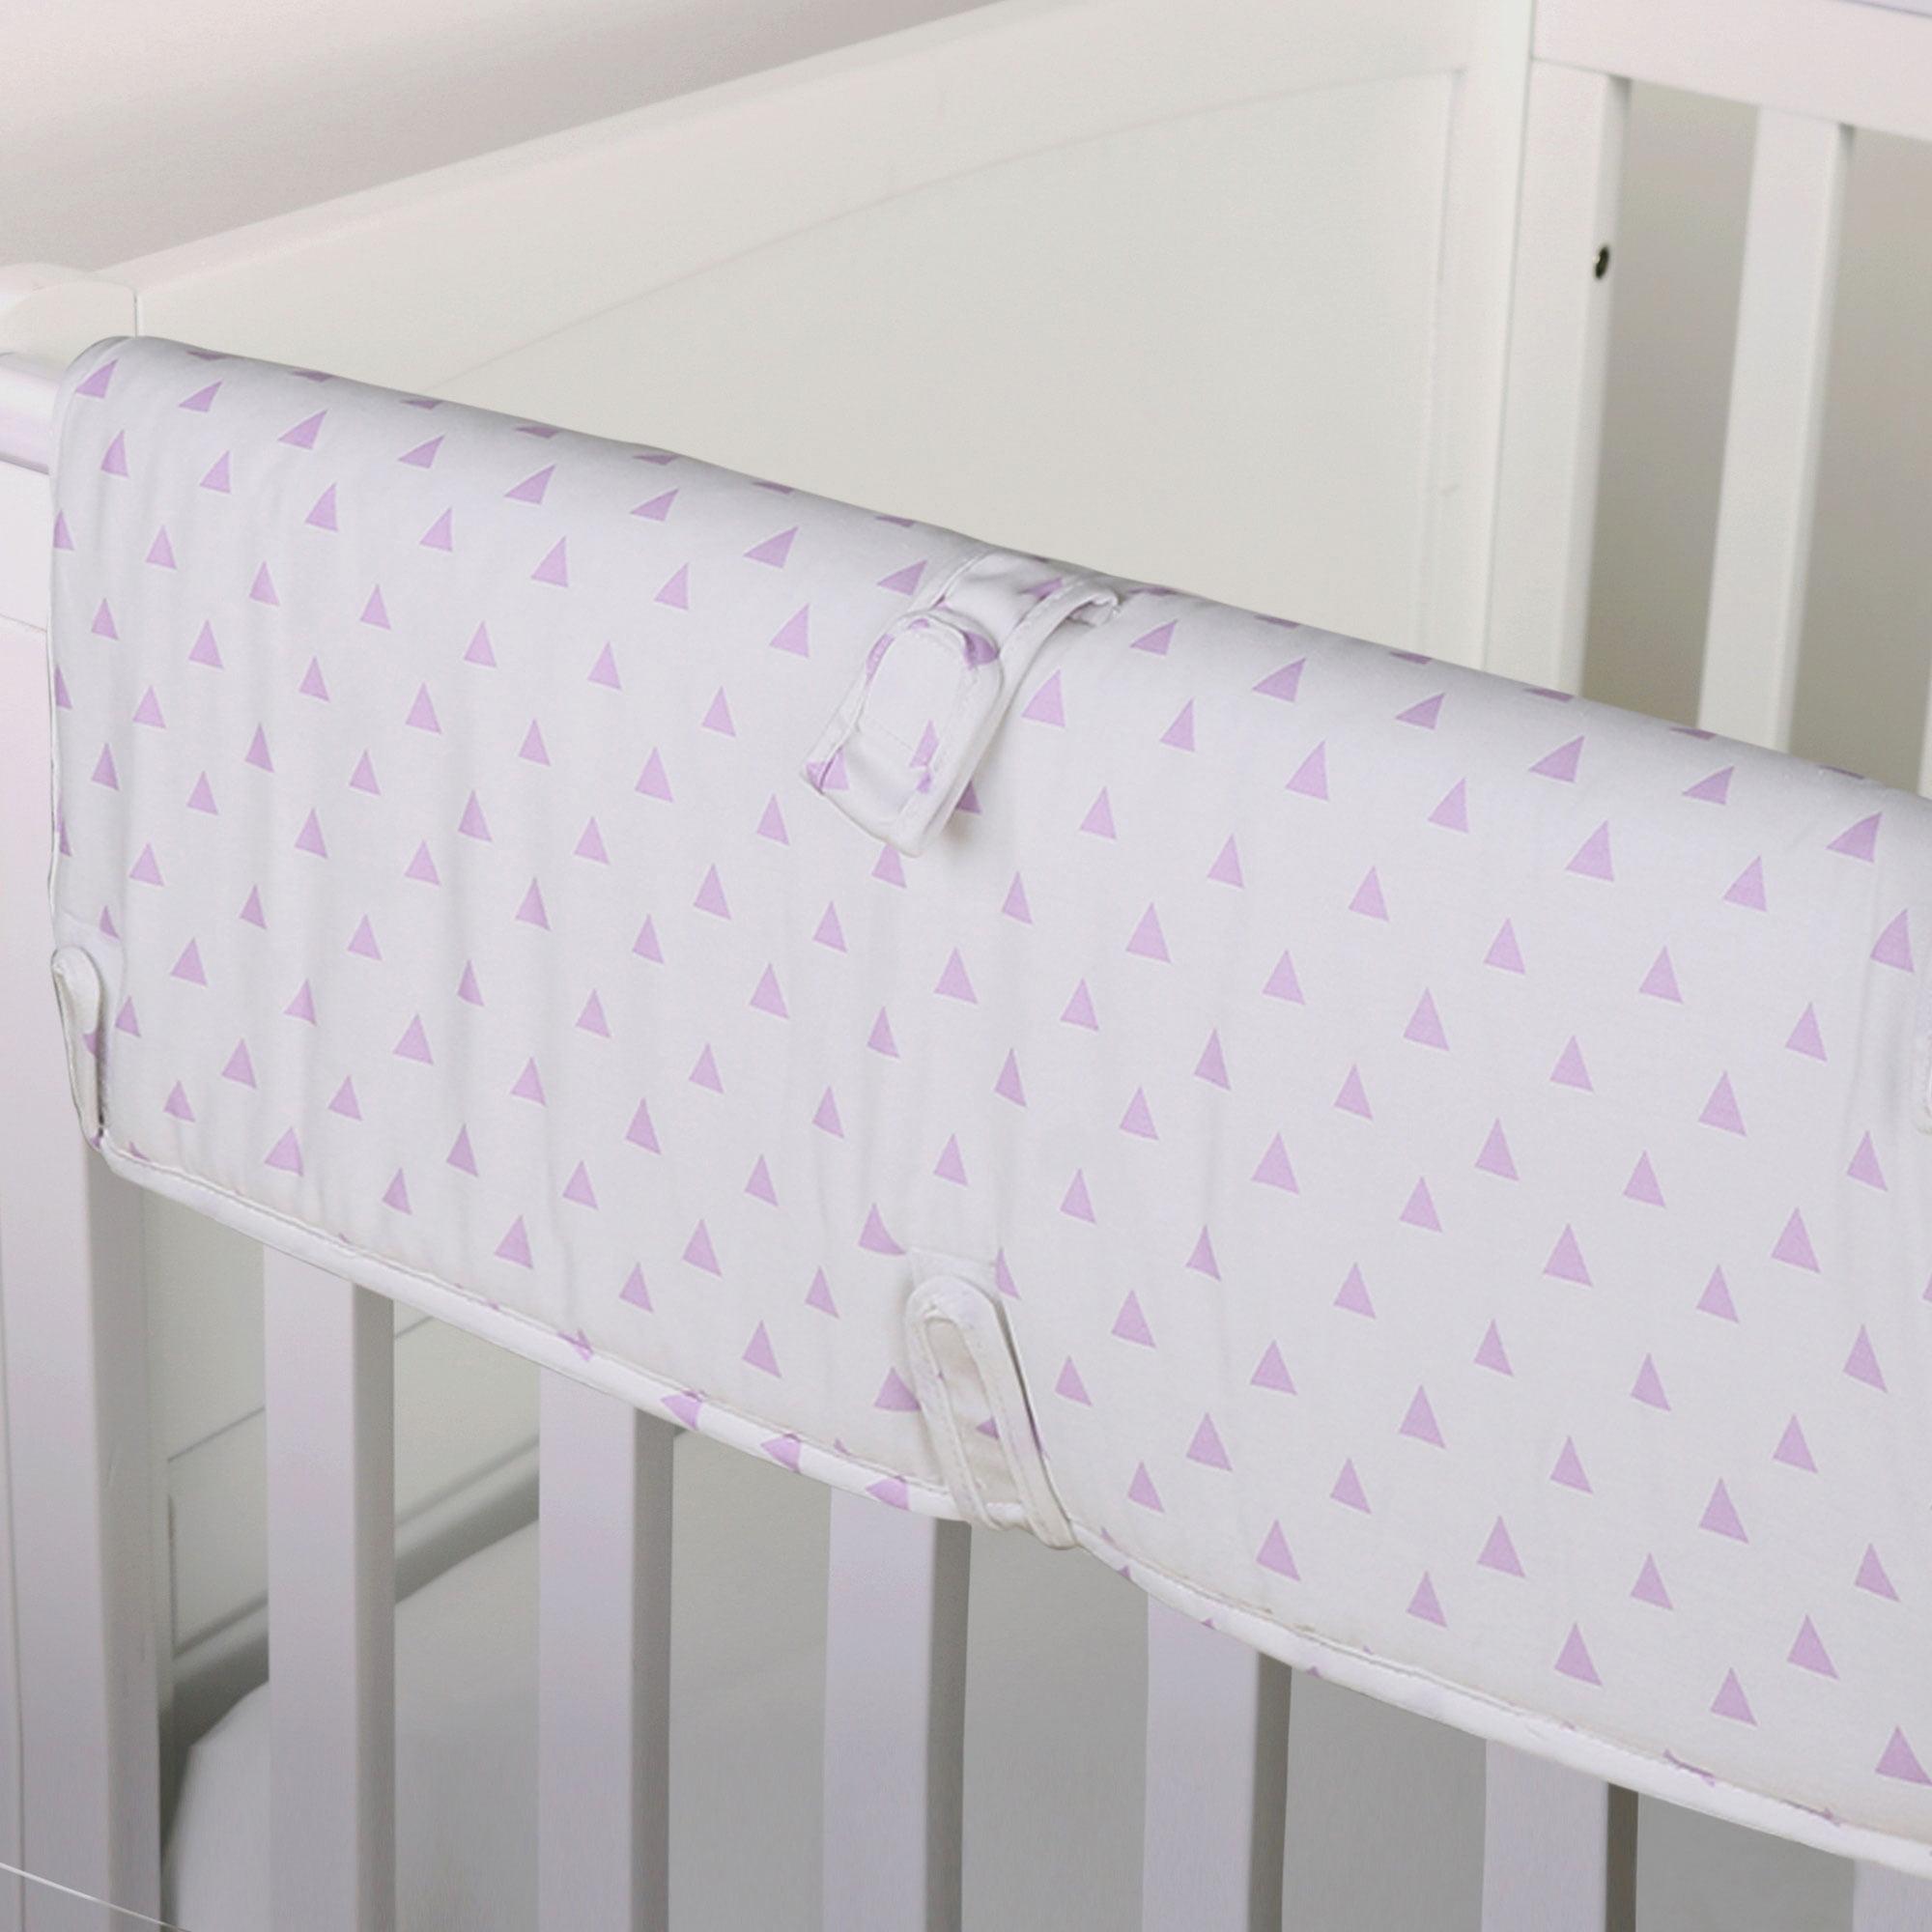 The Peanut Shell Baby Crib Rail Guard - Purple Geometric Triangle Print - 100% Cotton Sateen Cover, Polyester Fill